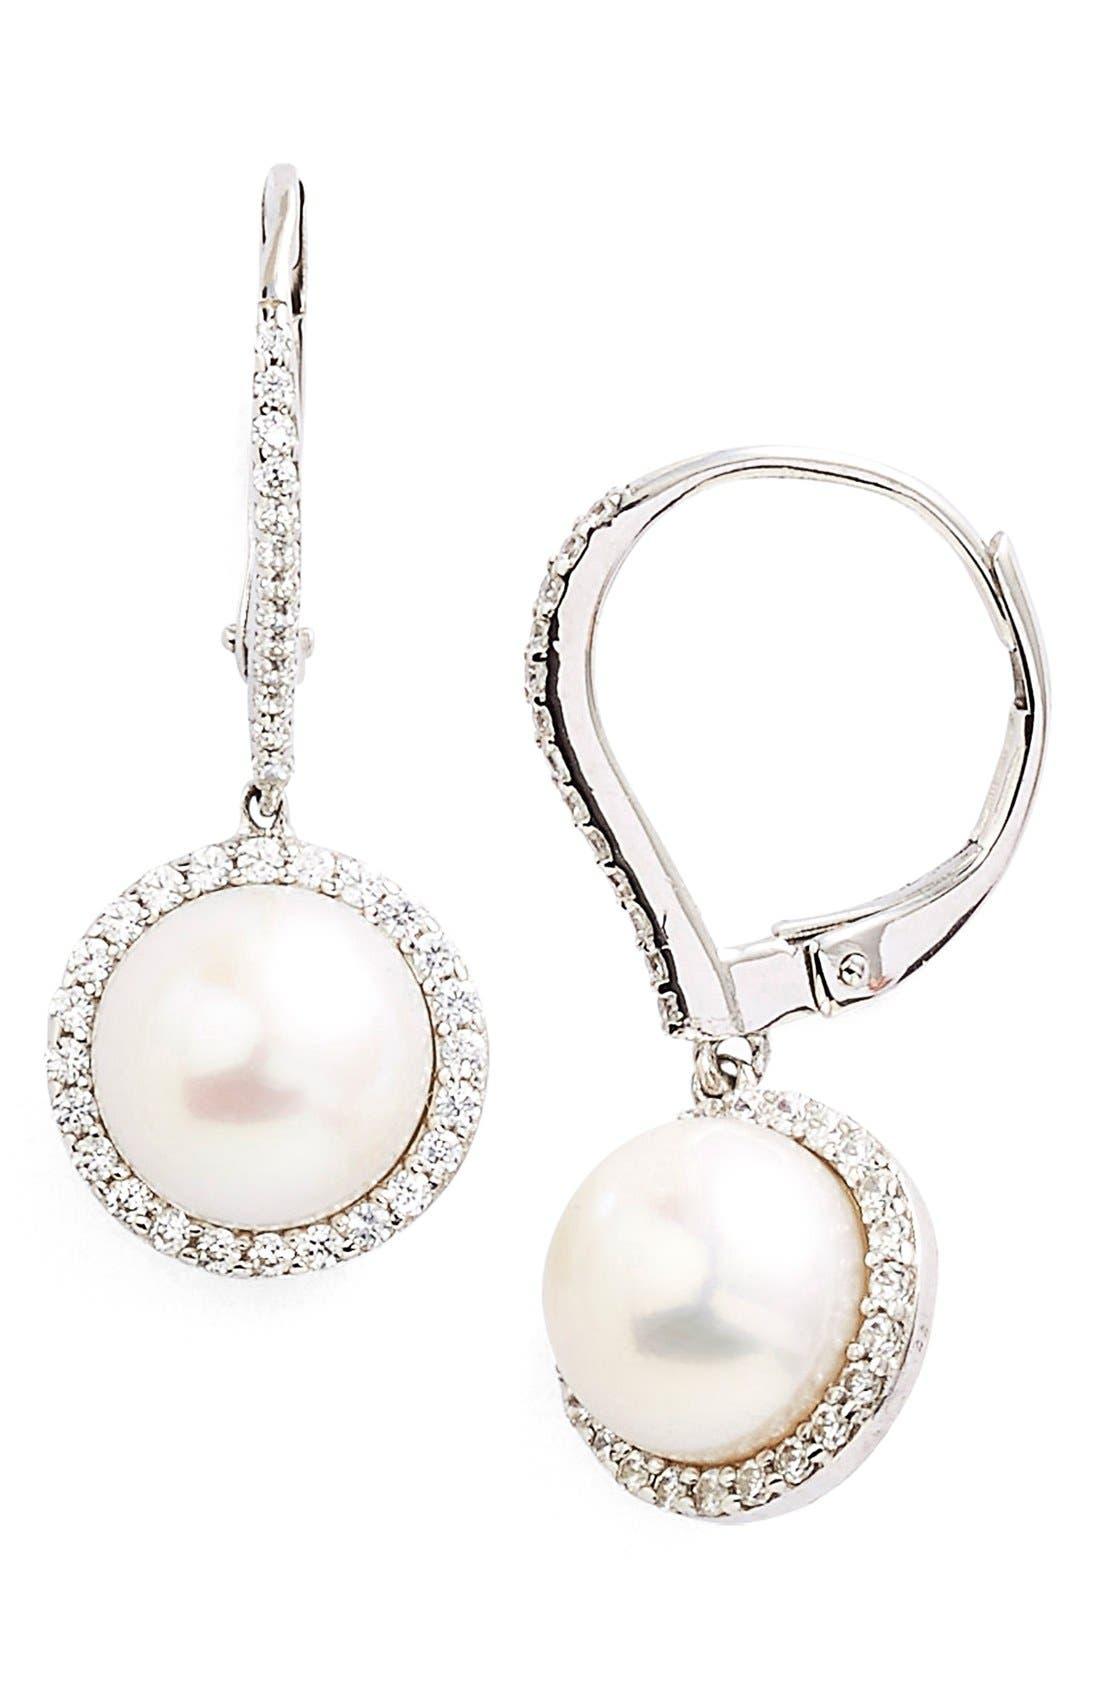 'Lassaire' Pearl Drop Earrings,                         Main,                         color, SILVER/ CLEAR